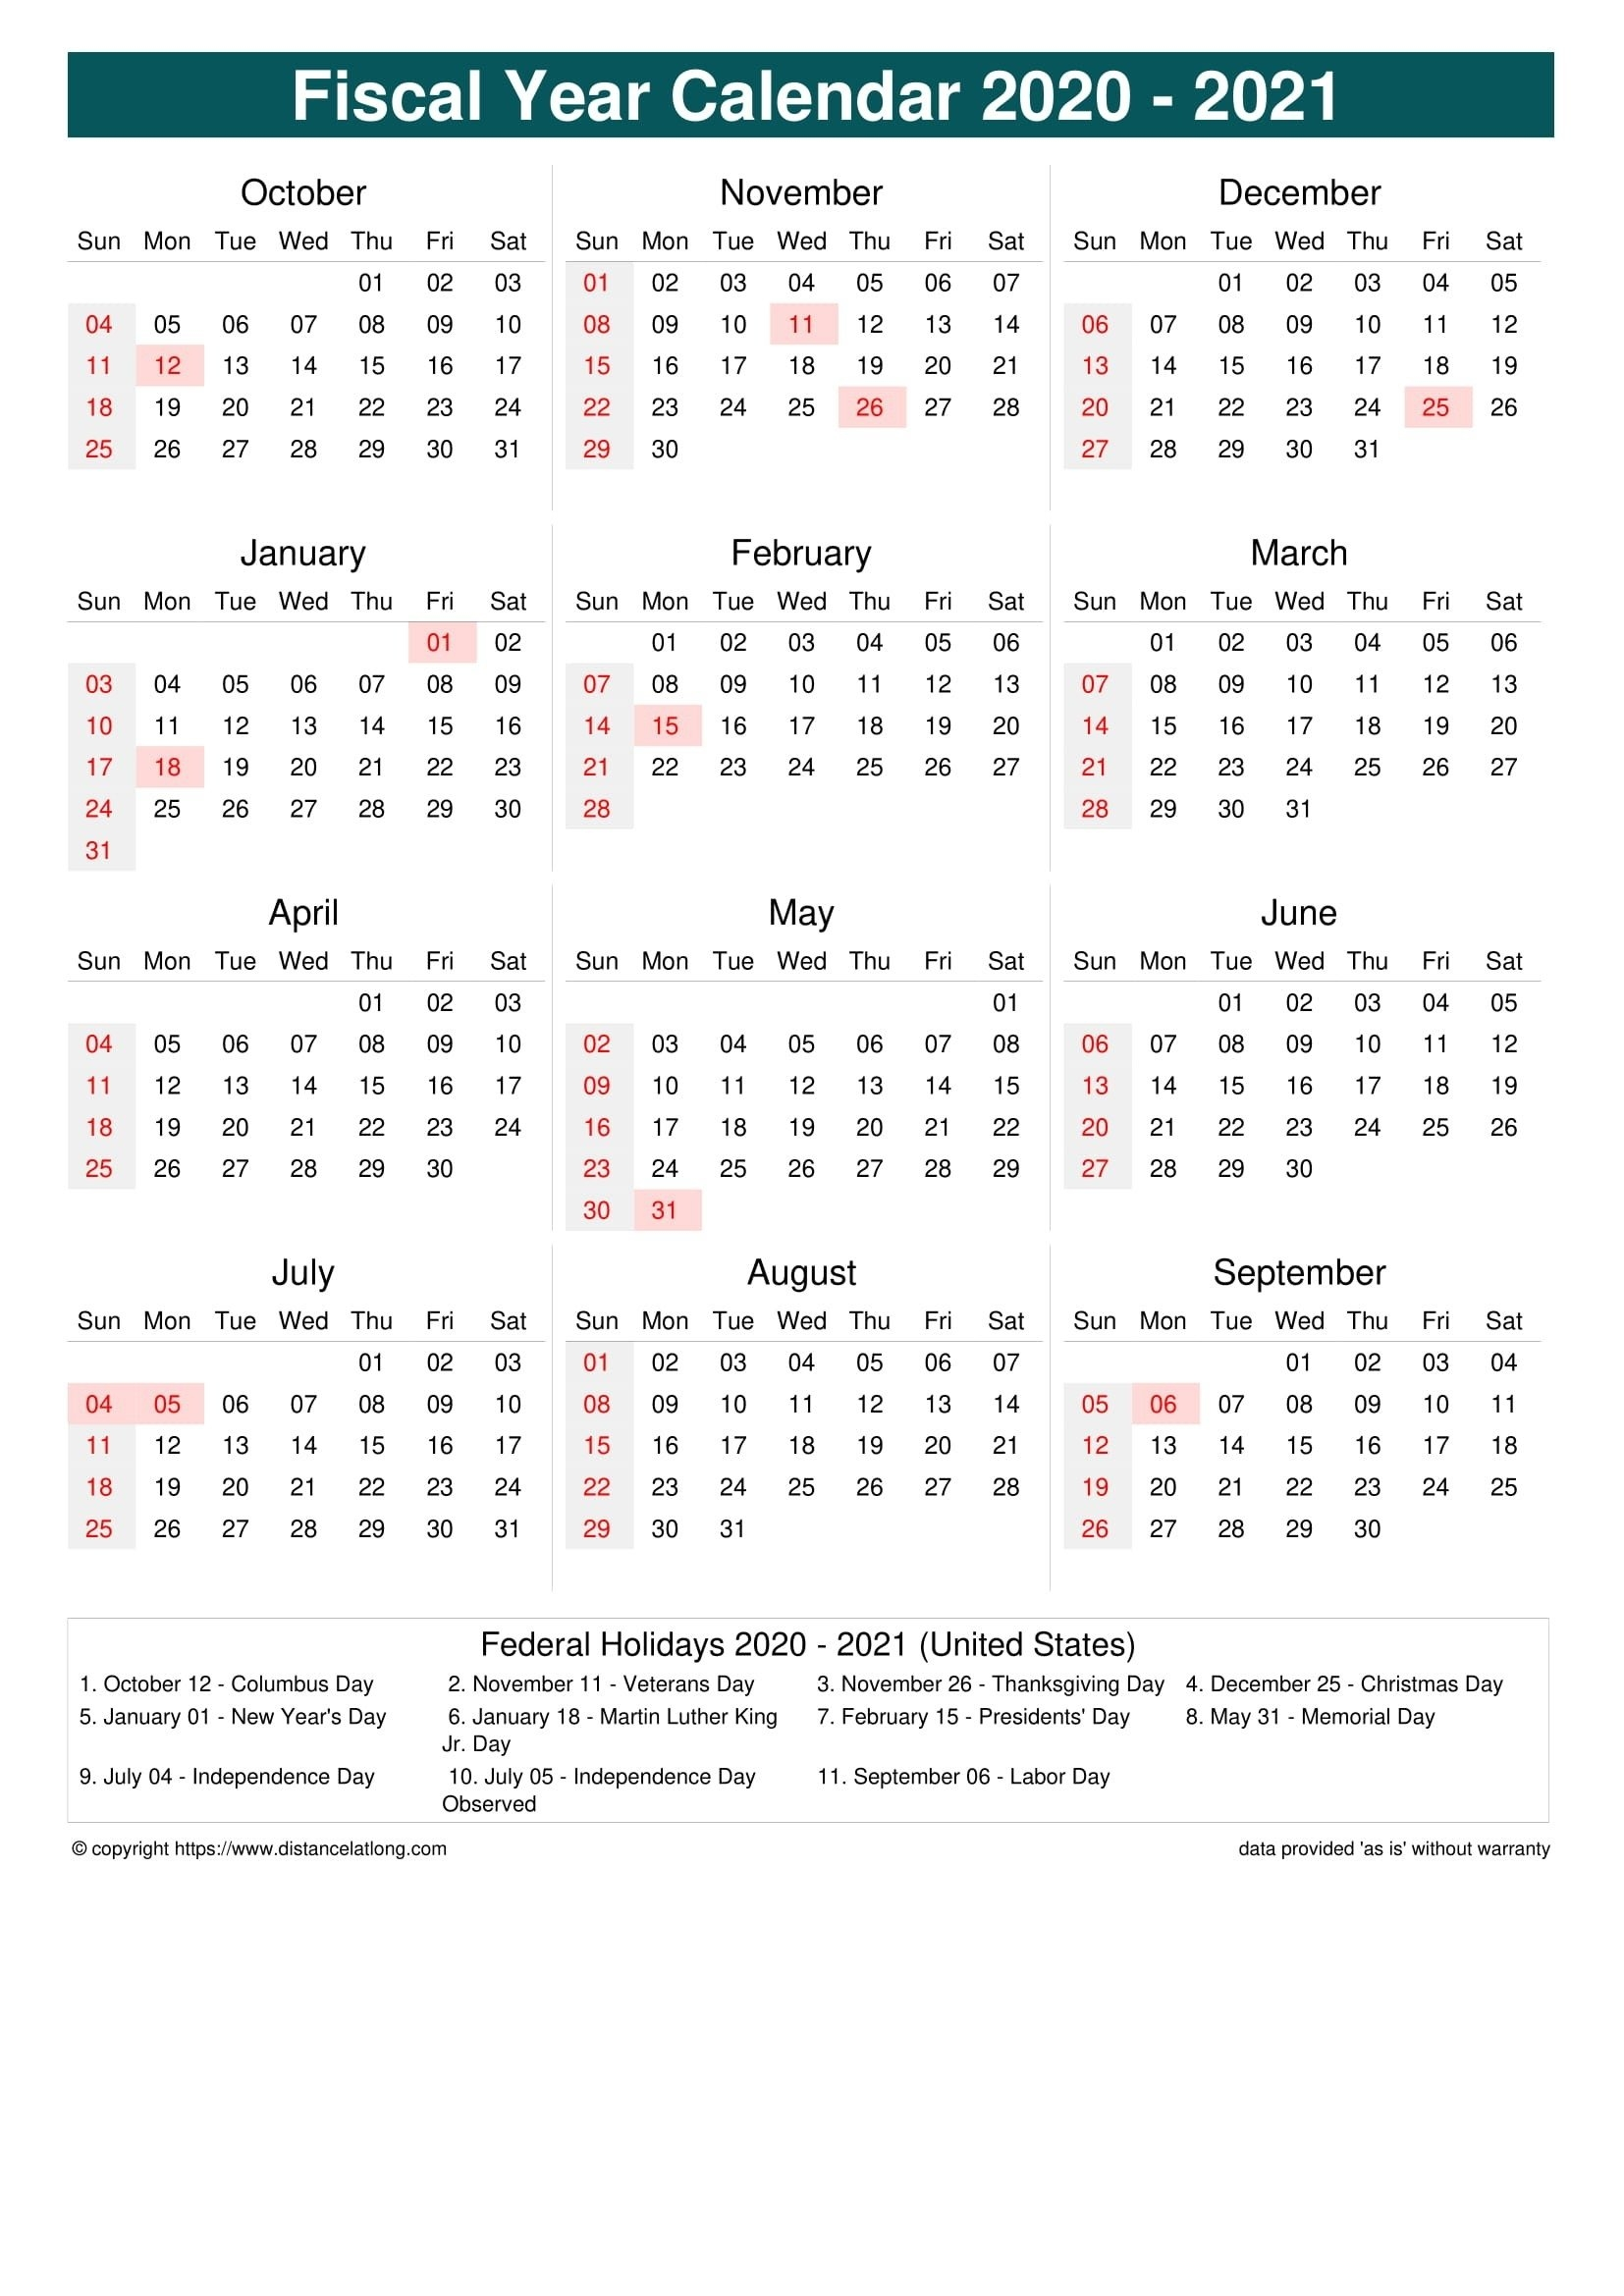 Fiscal Year Australia 2021 - Template Calendar Design in 2021 Australian Calendars To Print Photo